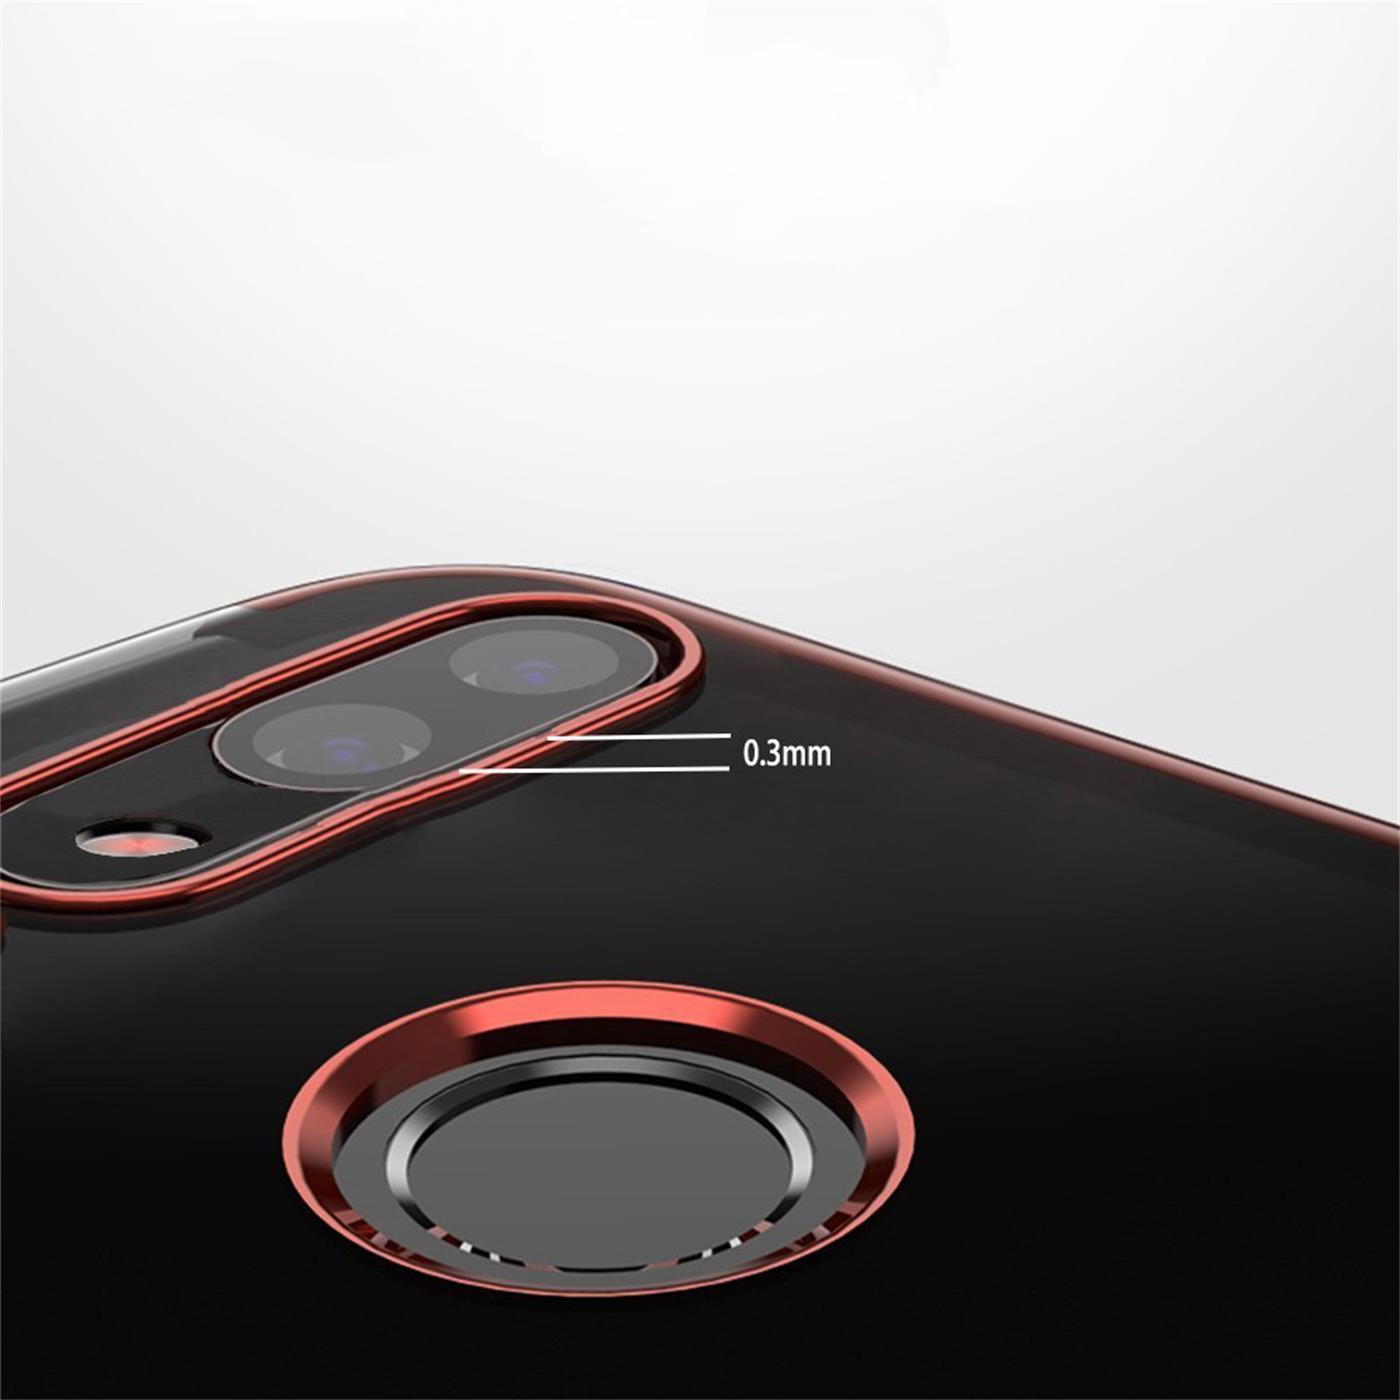 Silikon-Klar-Case-fuer-Huawei-p20-Lite-Ultra-Slim-Stossfeste-Gel-Rueckseite Indexbild 22